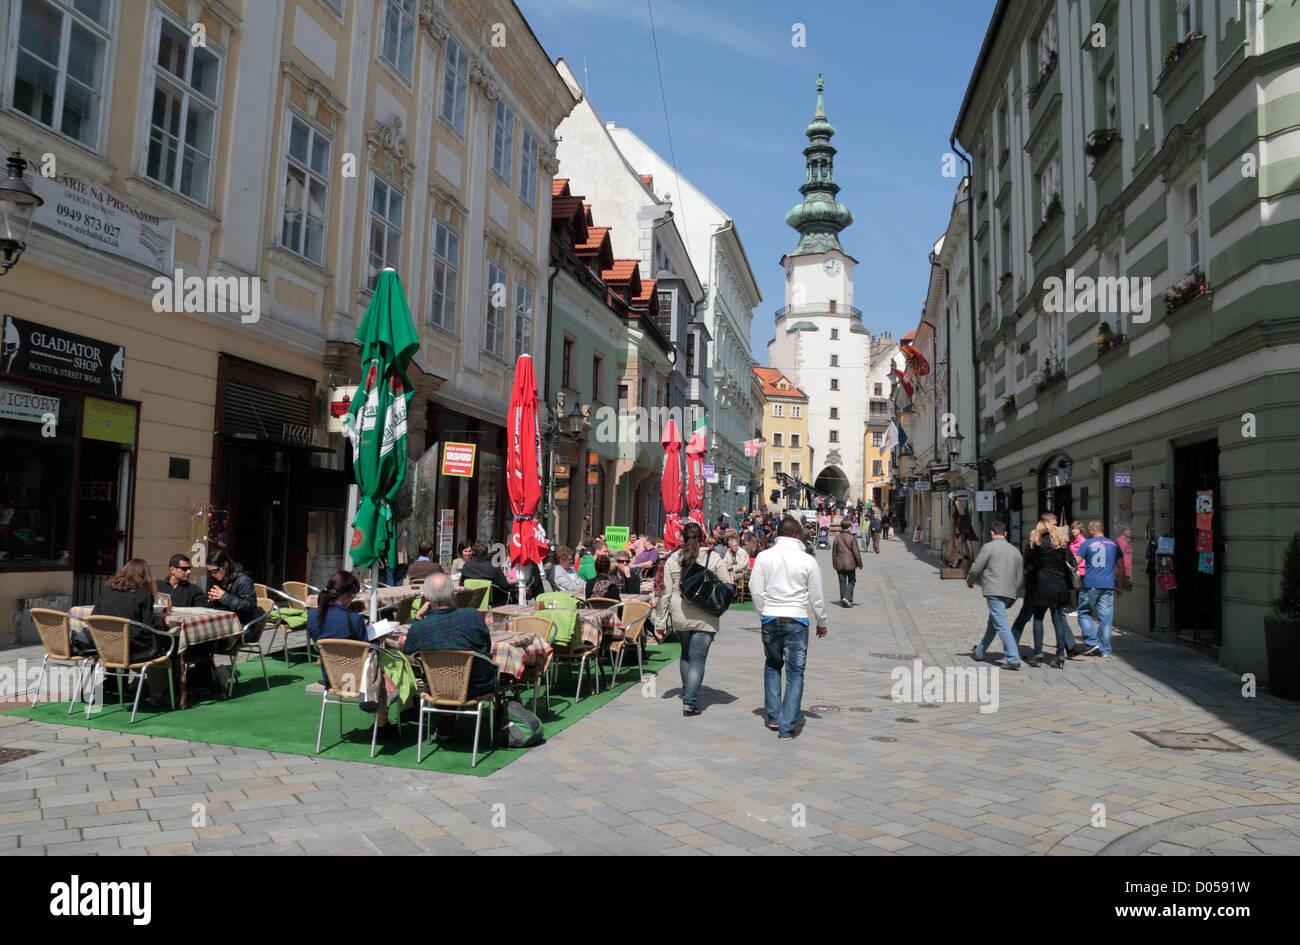 Cafe culture on Michalská Street looking up towards Michael's Gate (Michaelertor) in Bratislava, Slovakia. - Stock Image